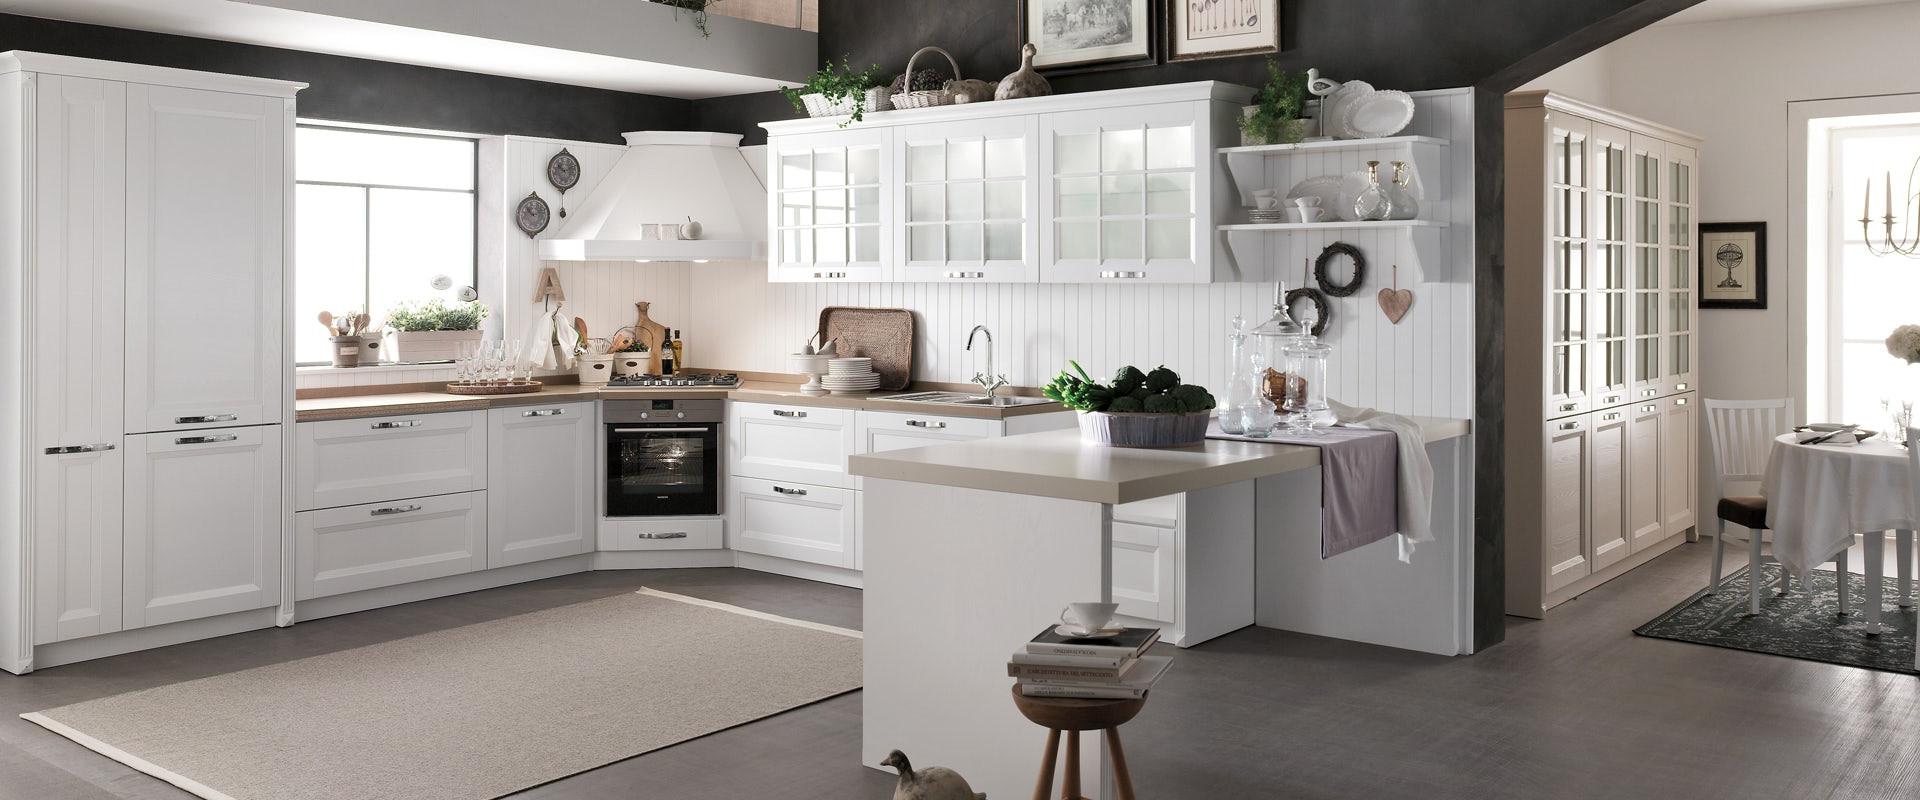 stosa-cucine-classiche-beverly-28.jpg